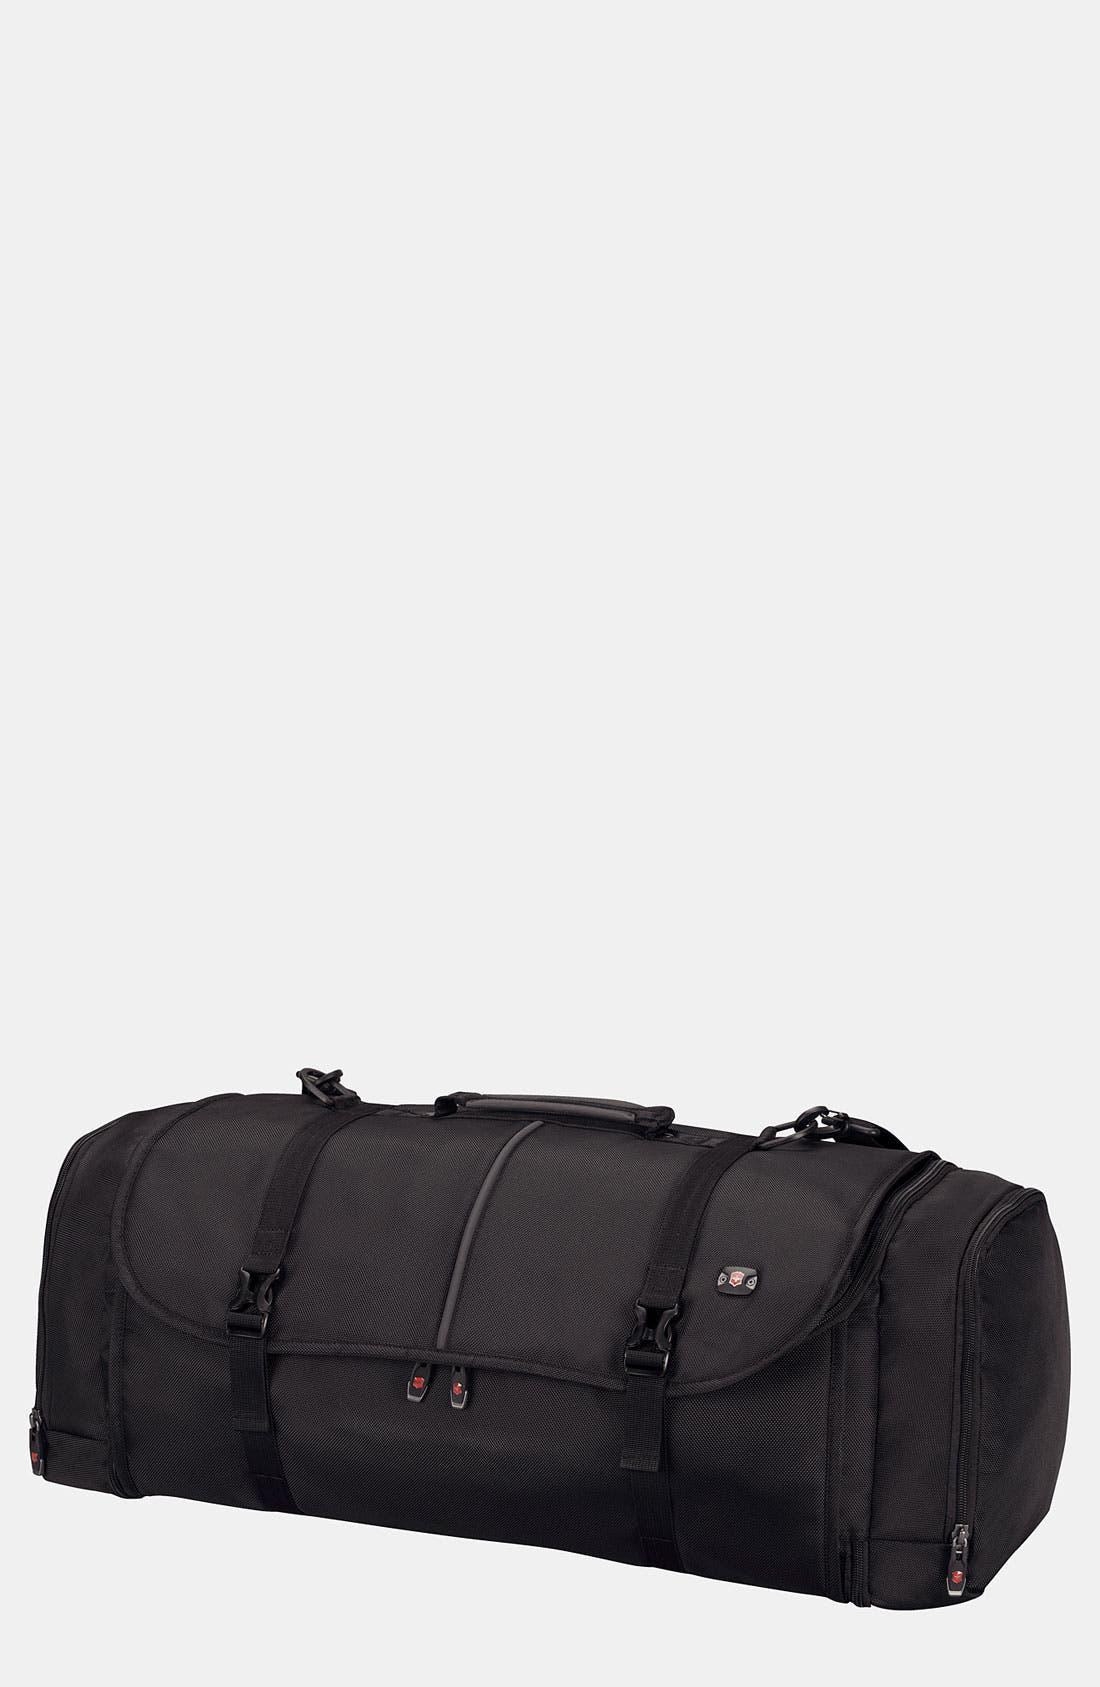 Main Image - Victorinox Swiss Army® Hybrid Garment/Duffel Bag